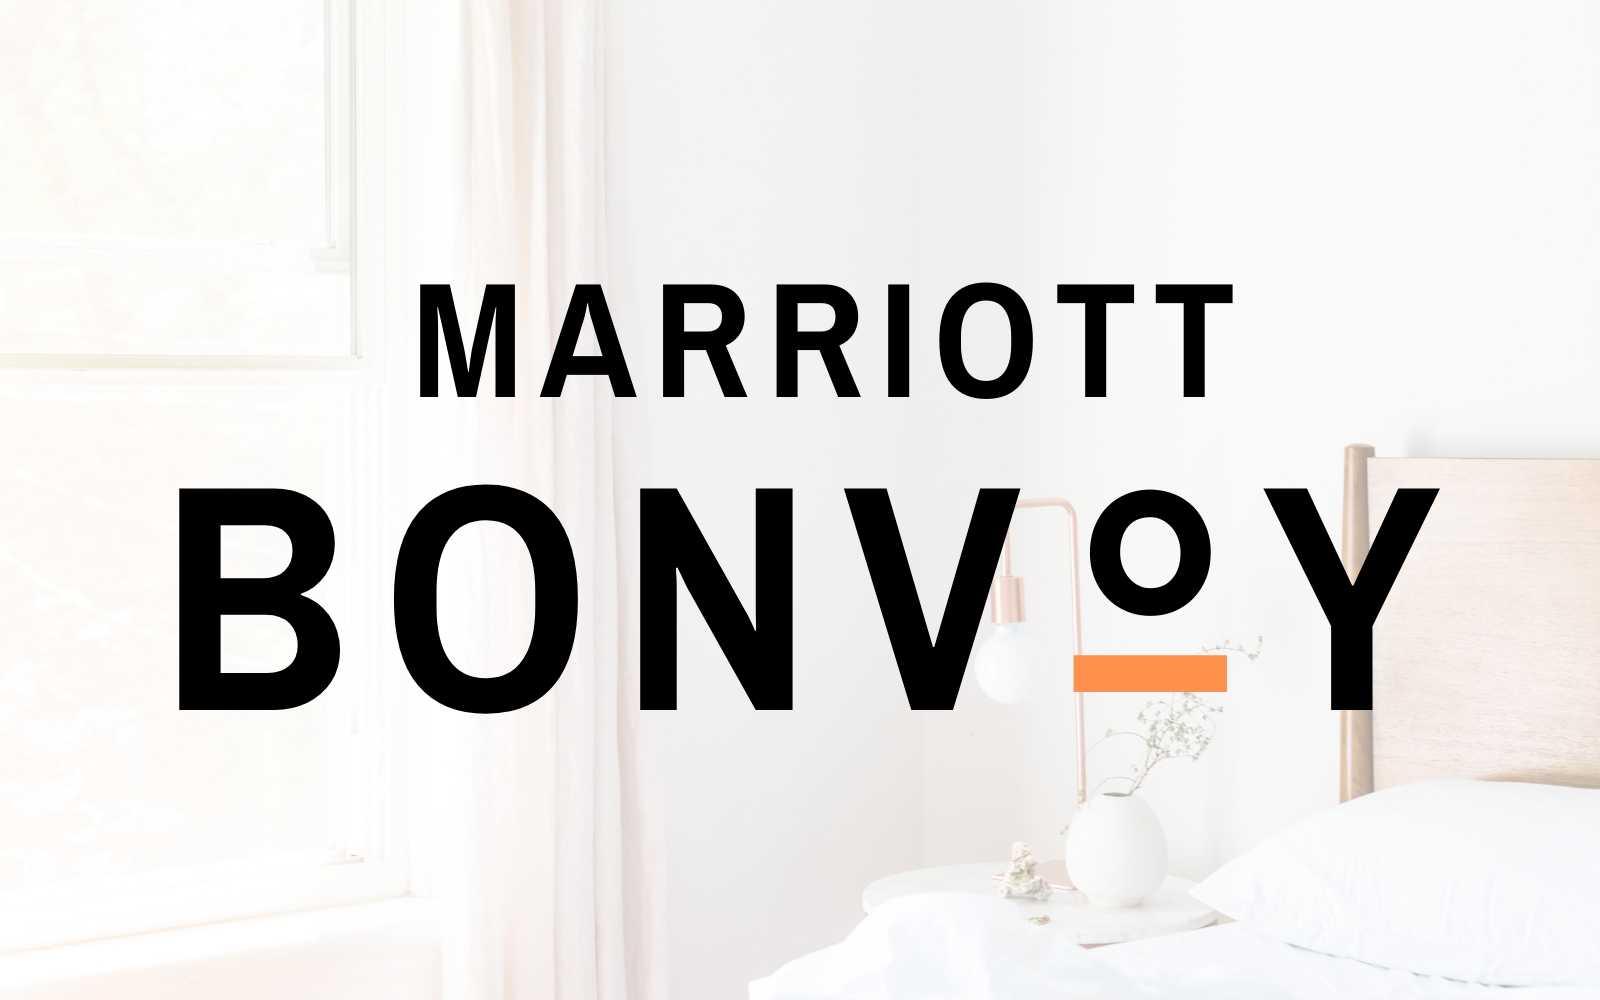 Marriott Banvoy Membership